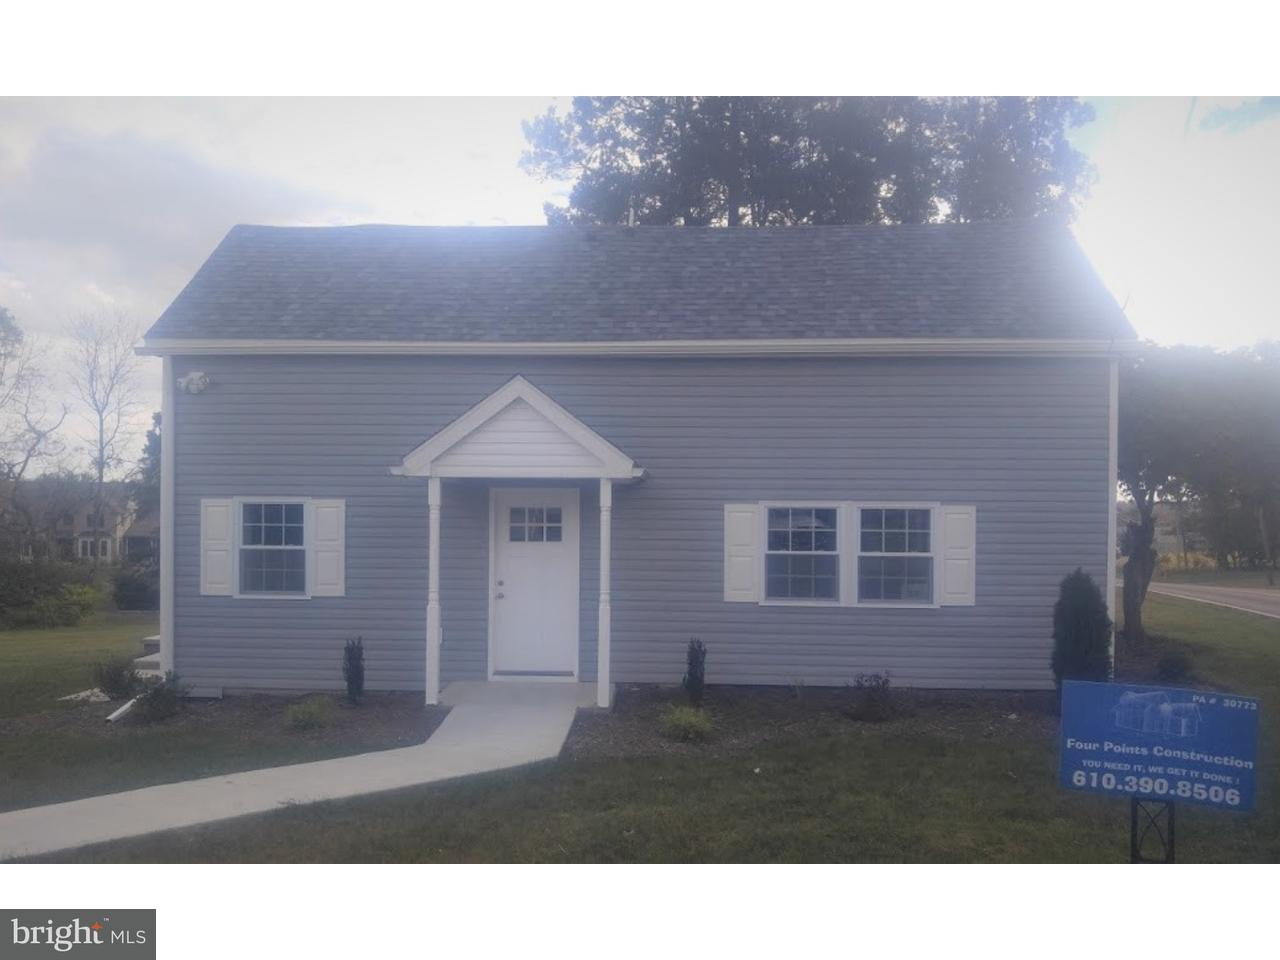 Single Family Home for Sale at 4258 MOUNTAIN Road Slatington, Pennsylvania 18080 United States